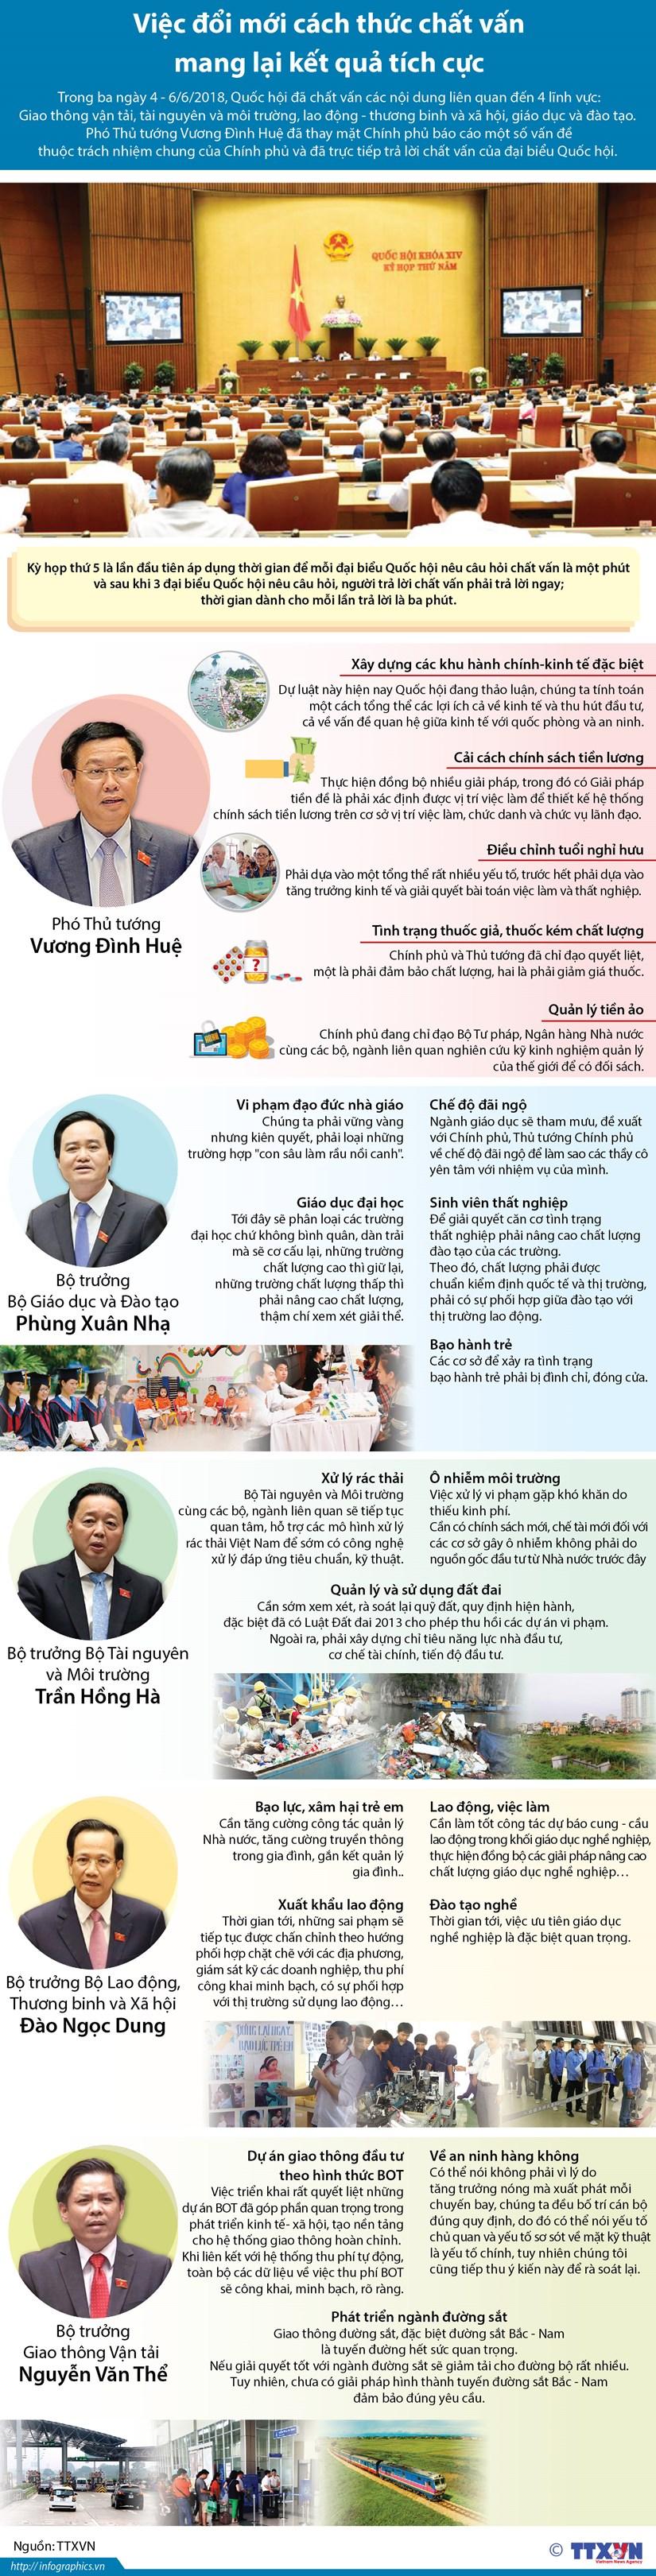 [Infographics] Tong hop cac buoi chat van tai Quoc hoi hinh anh 1